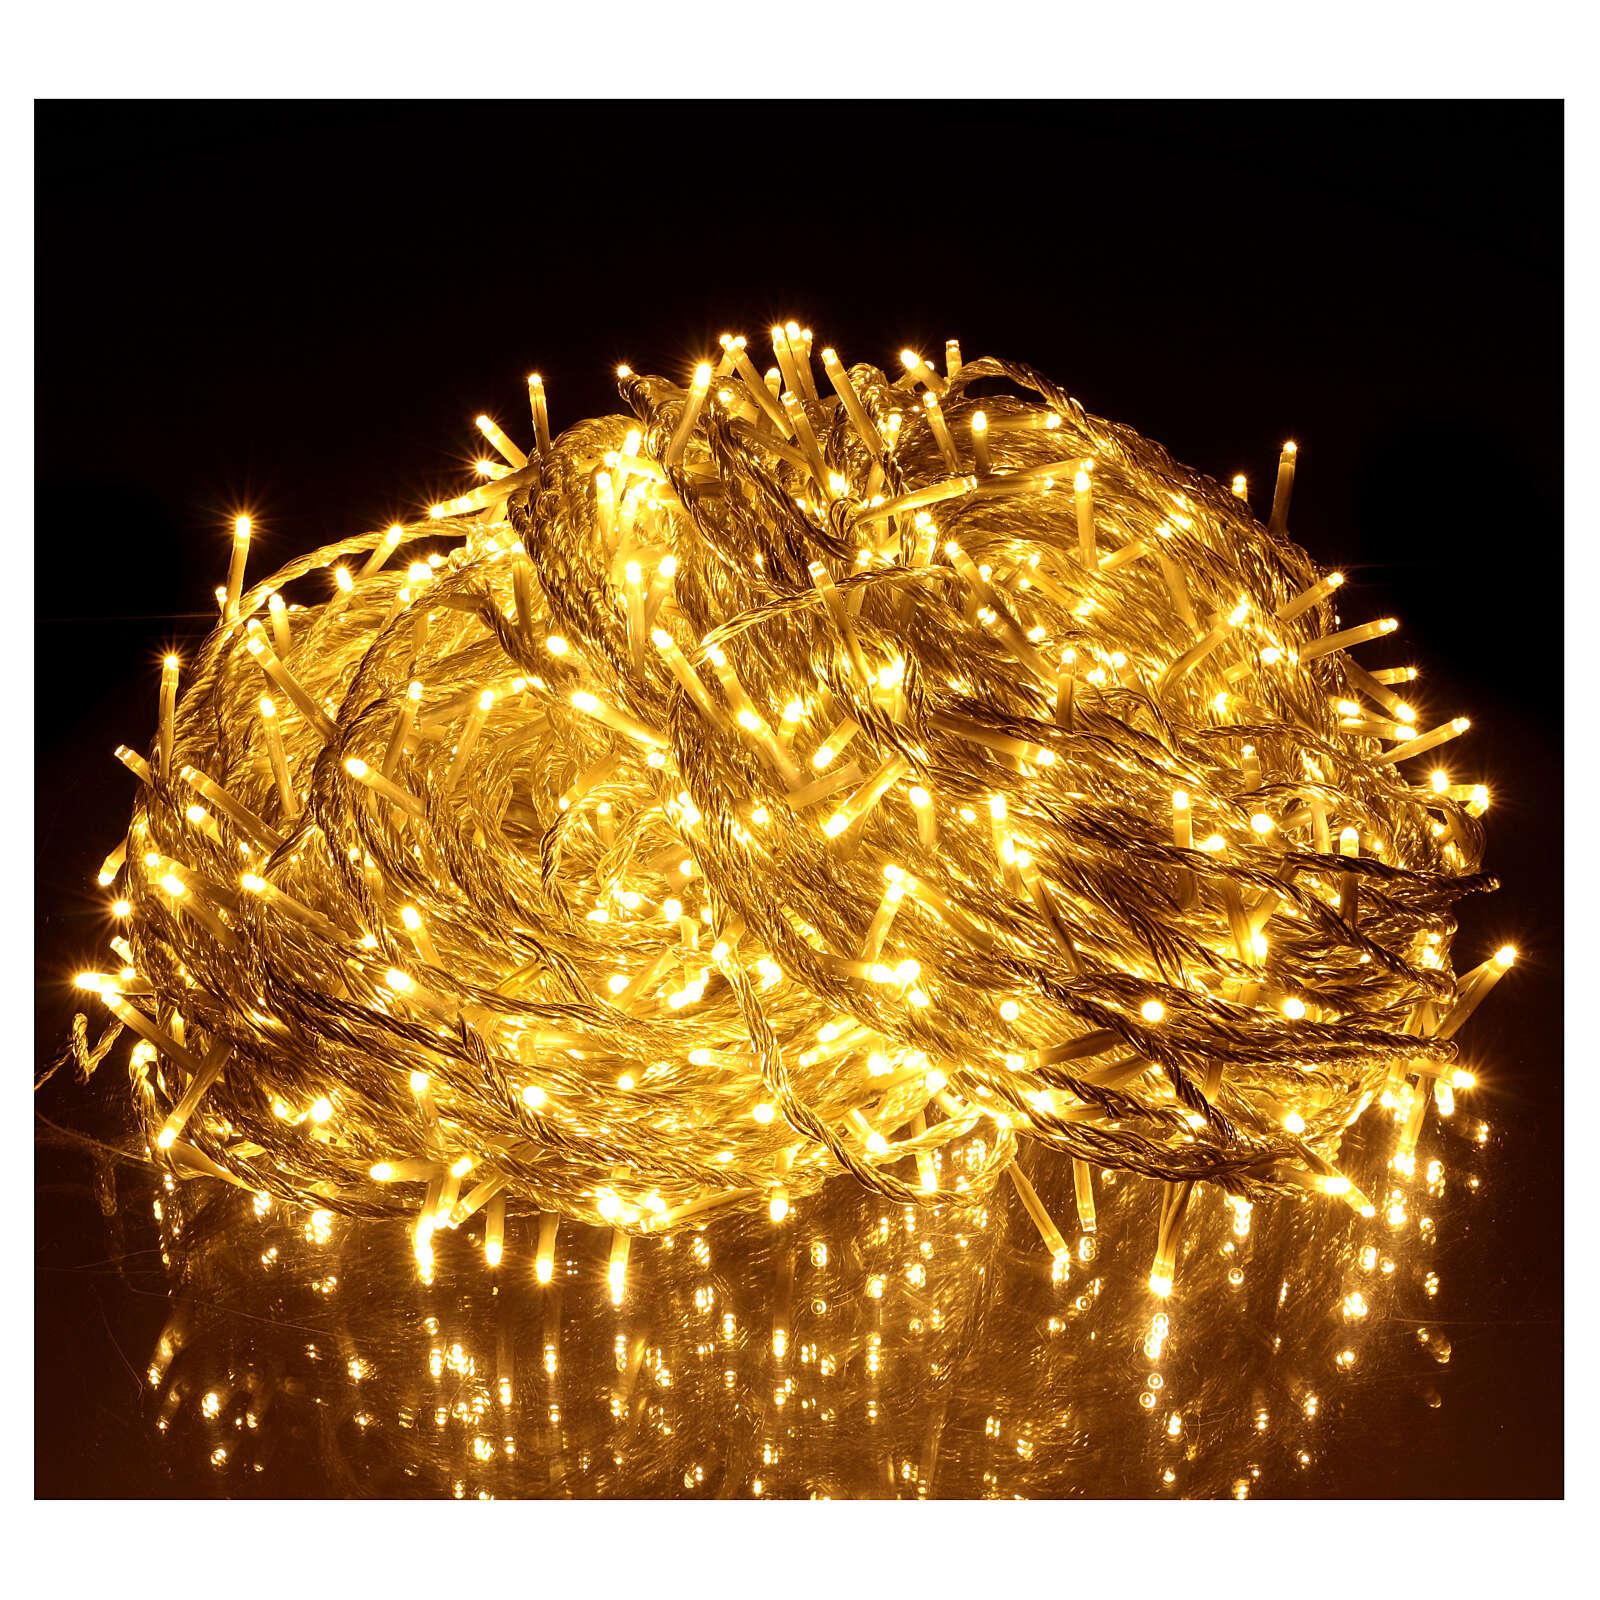 Luce Natale catena 1000 Led bianchi luce calda esterni flash control unit 100 m 3